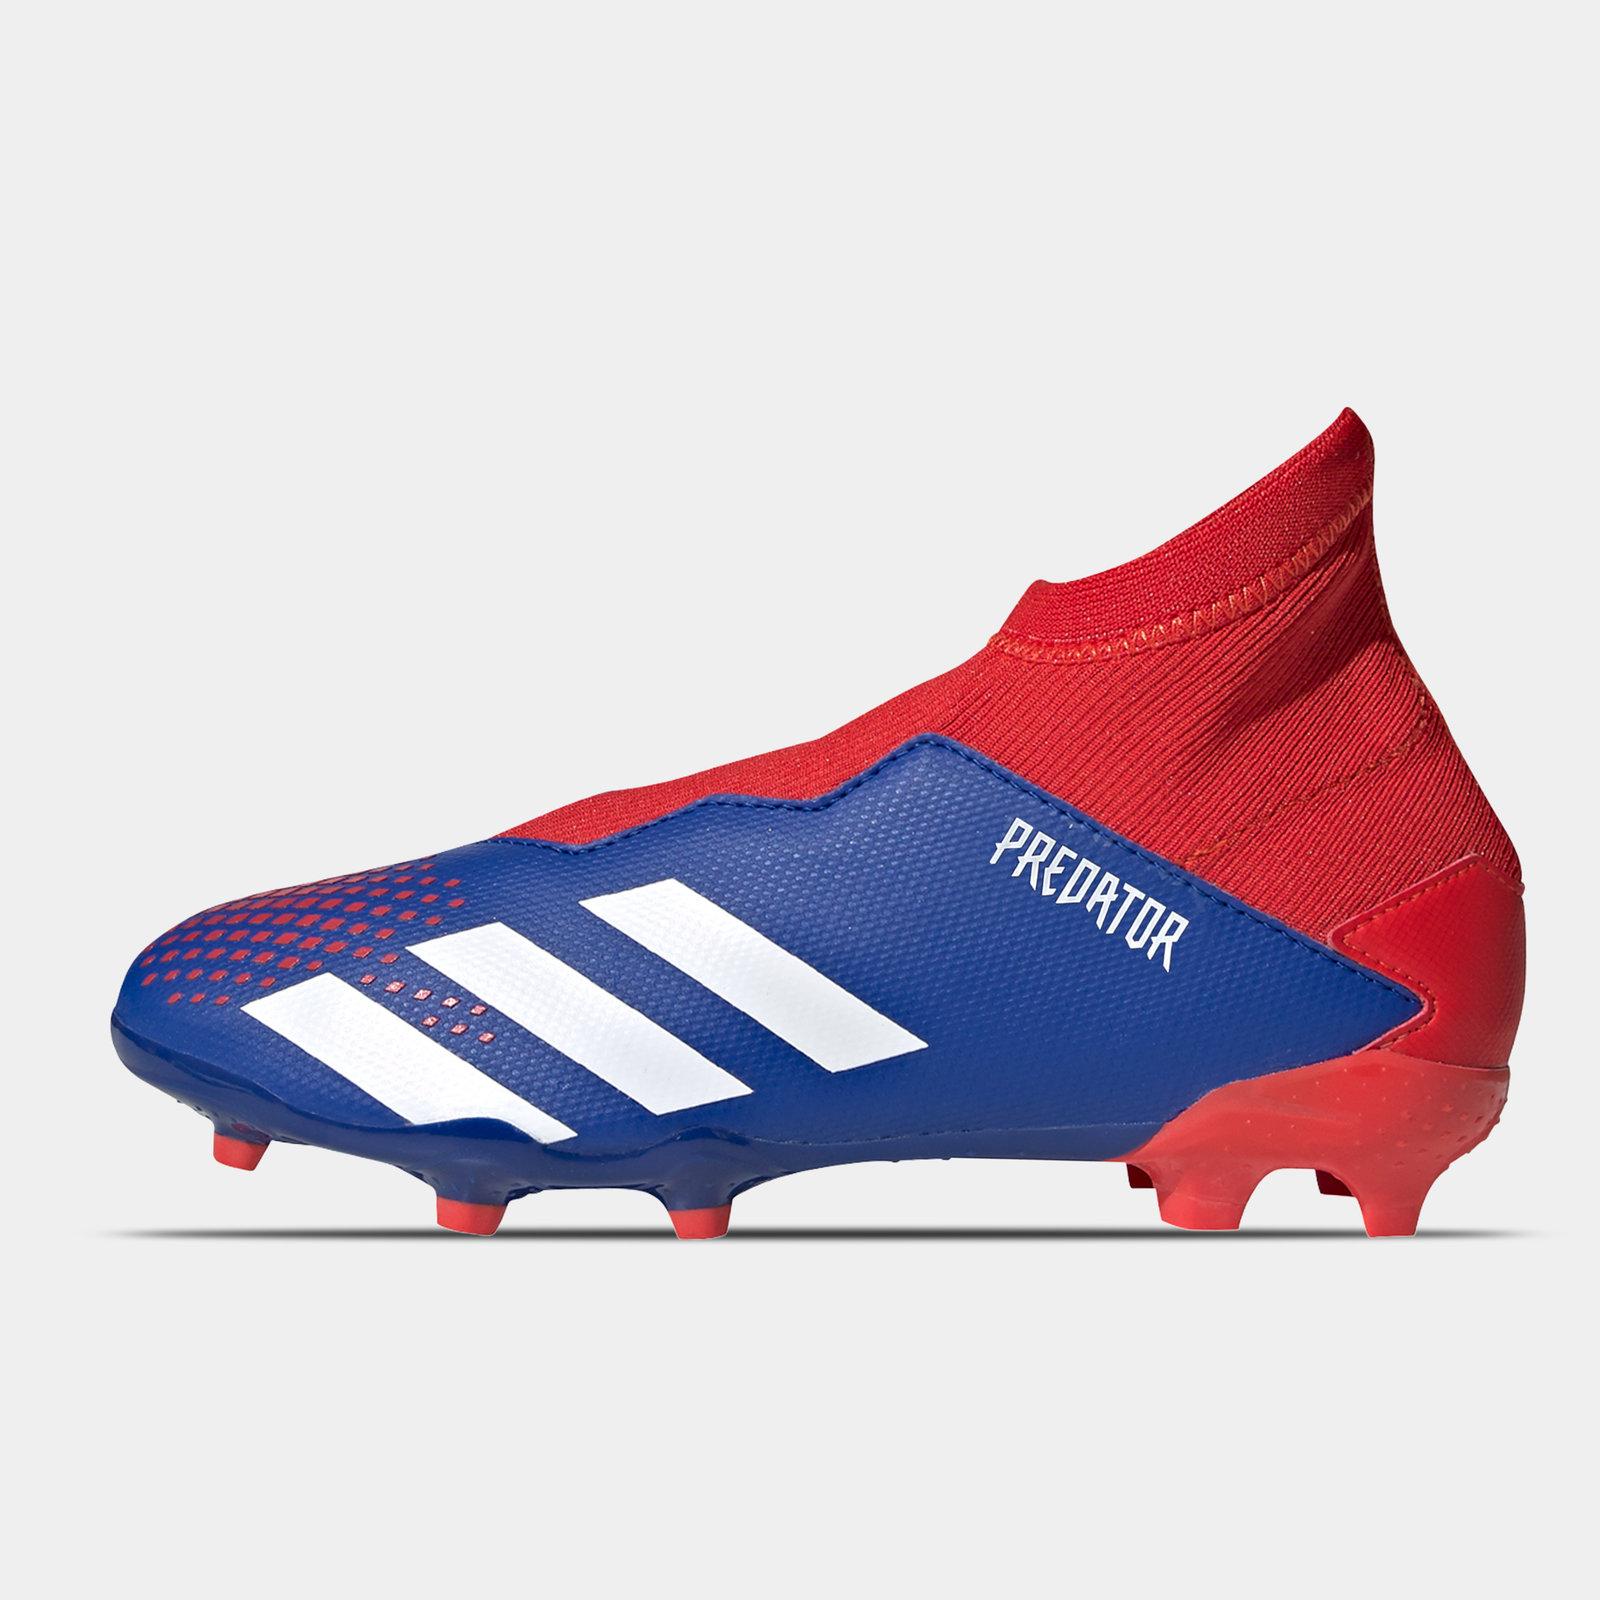 Predator 20.3 Laceless Junior FG Football Boots